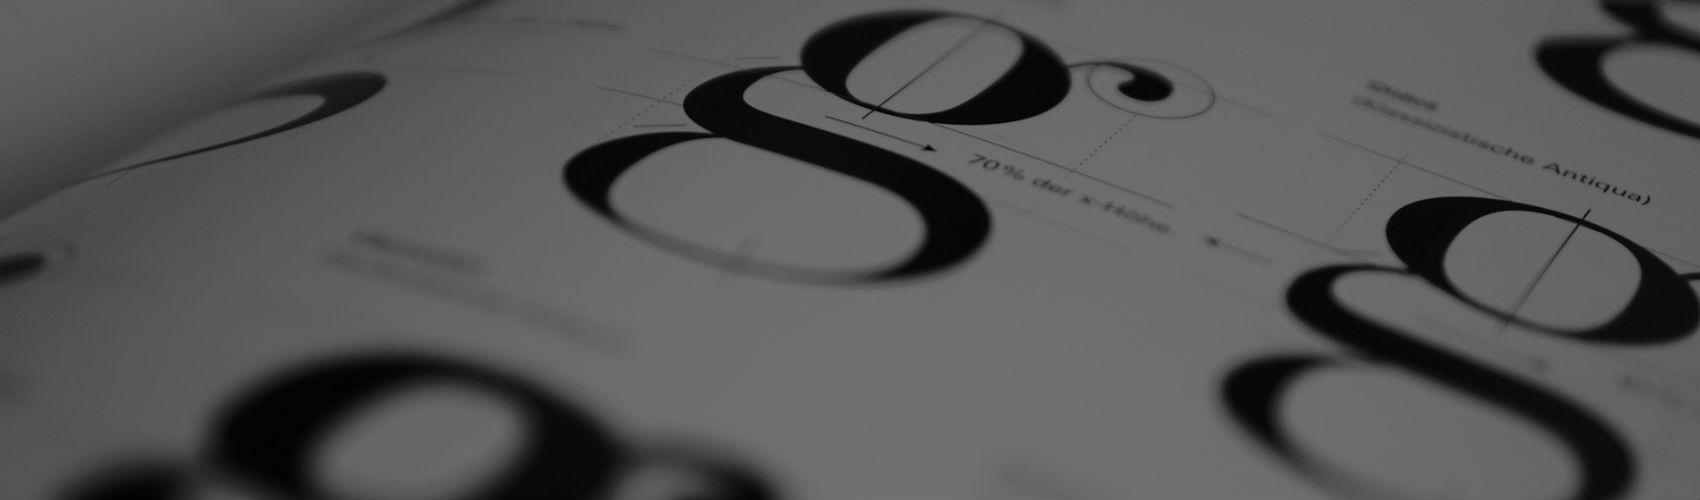 Choosing the Right Print Media Fonts